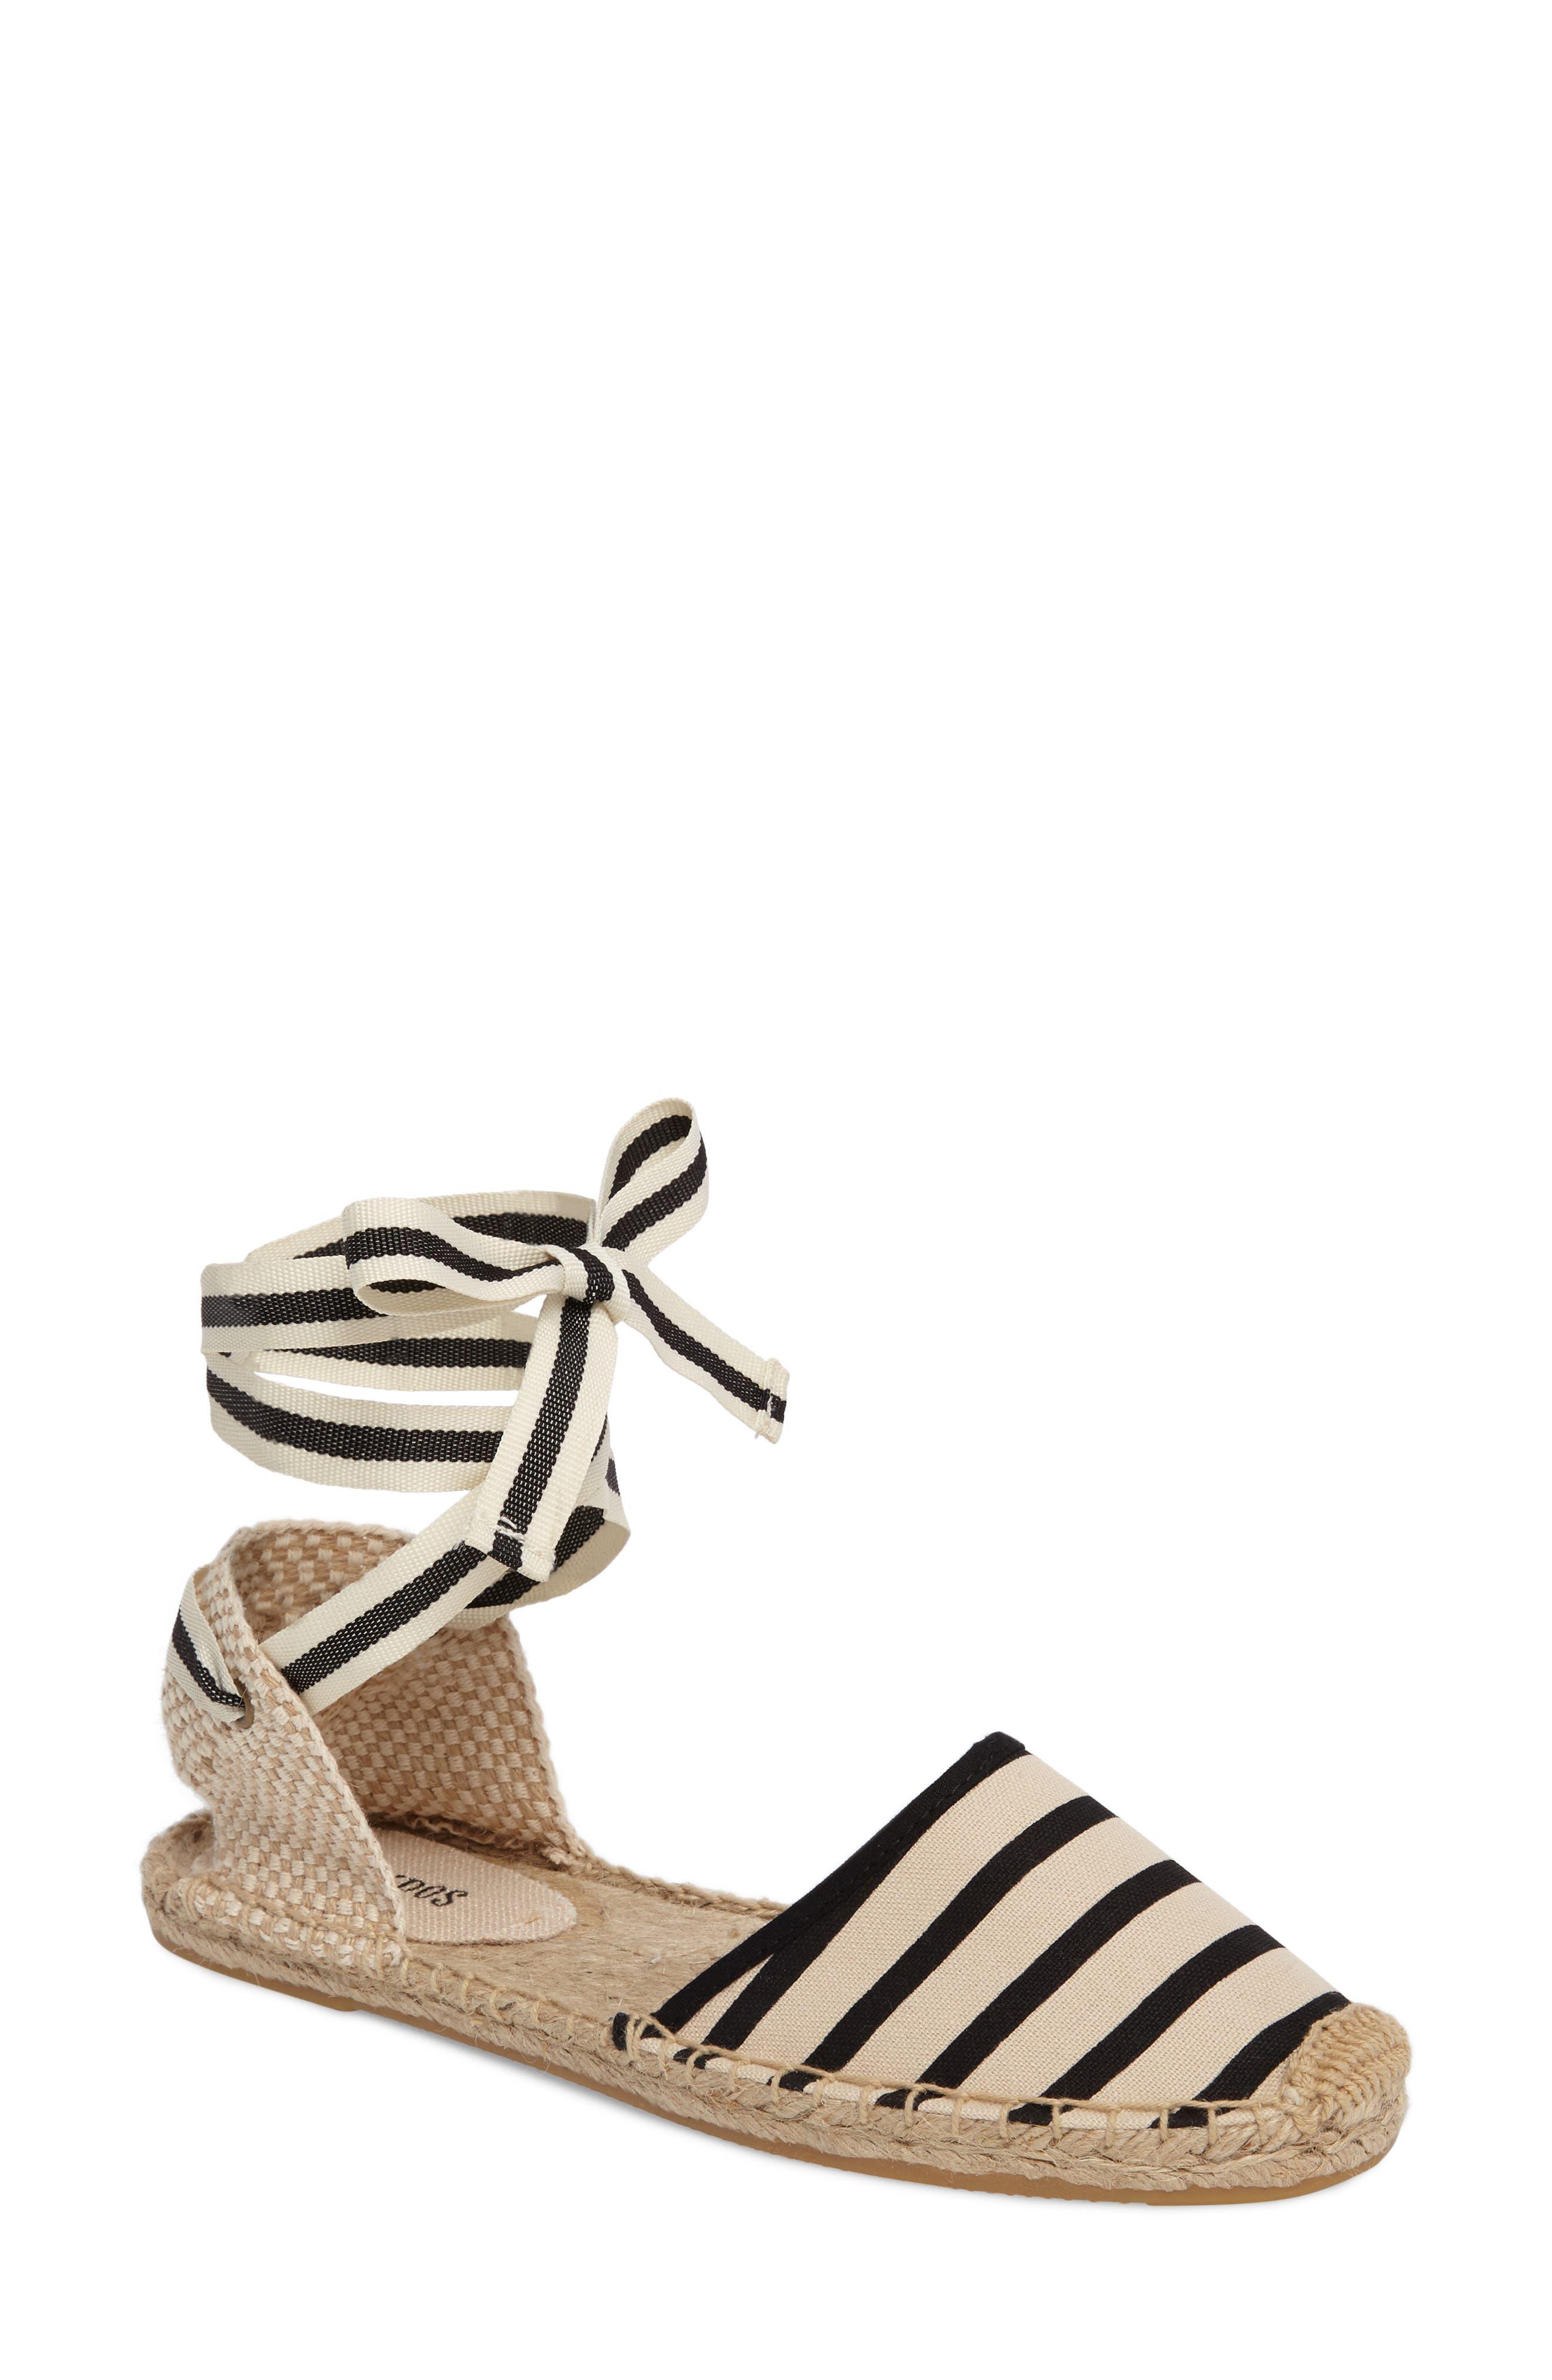 Lace-Up Espadrille Sandal,                         Main,                         color, New Natural/ Black Stripe